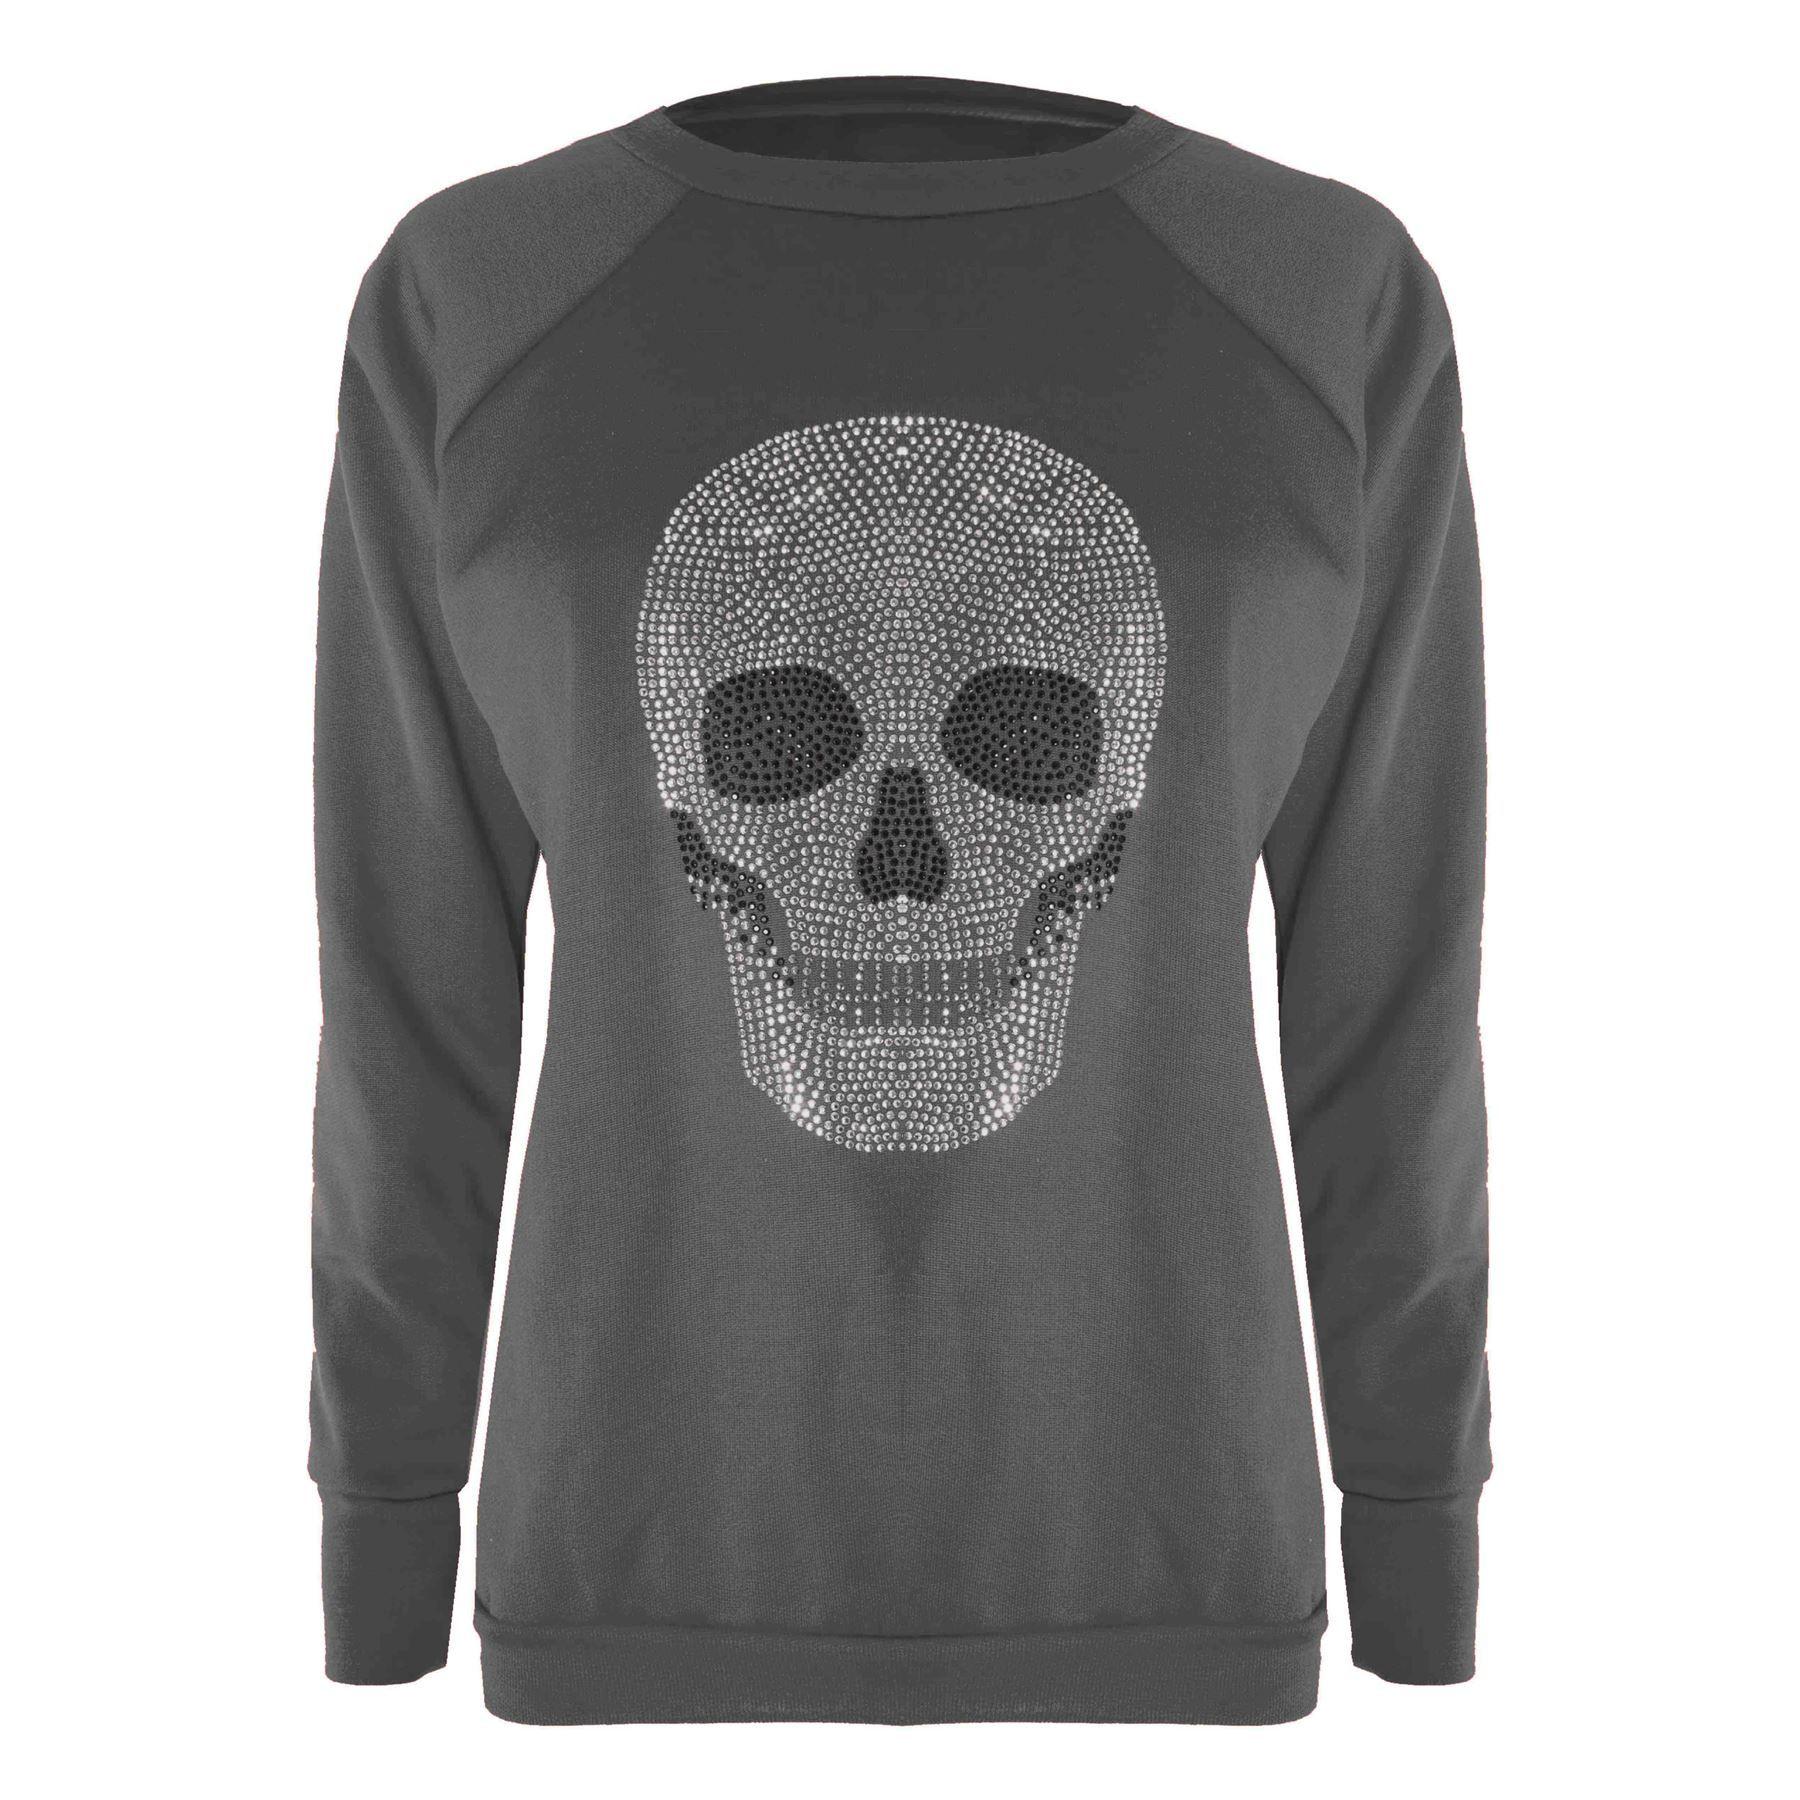 a865d1e8074d Ladies Womens Casual Skull Studded Long Sleeve Cross Peace Sweatshirt  Jumper#Skull#Studded#